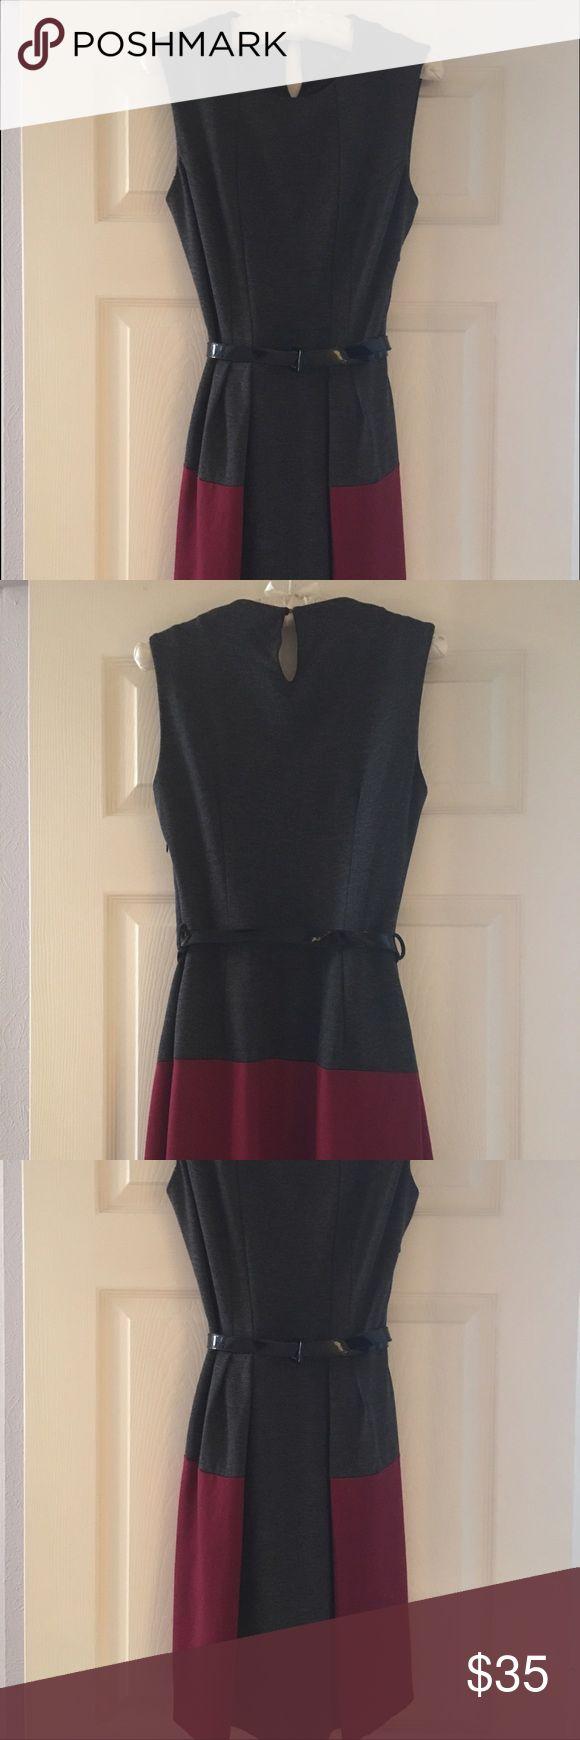 Mango Suit Dress Size M Gray/Red Mango dress with patent black belt Mango Dresses Midi